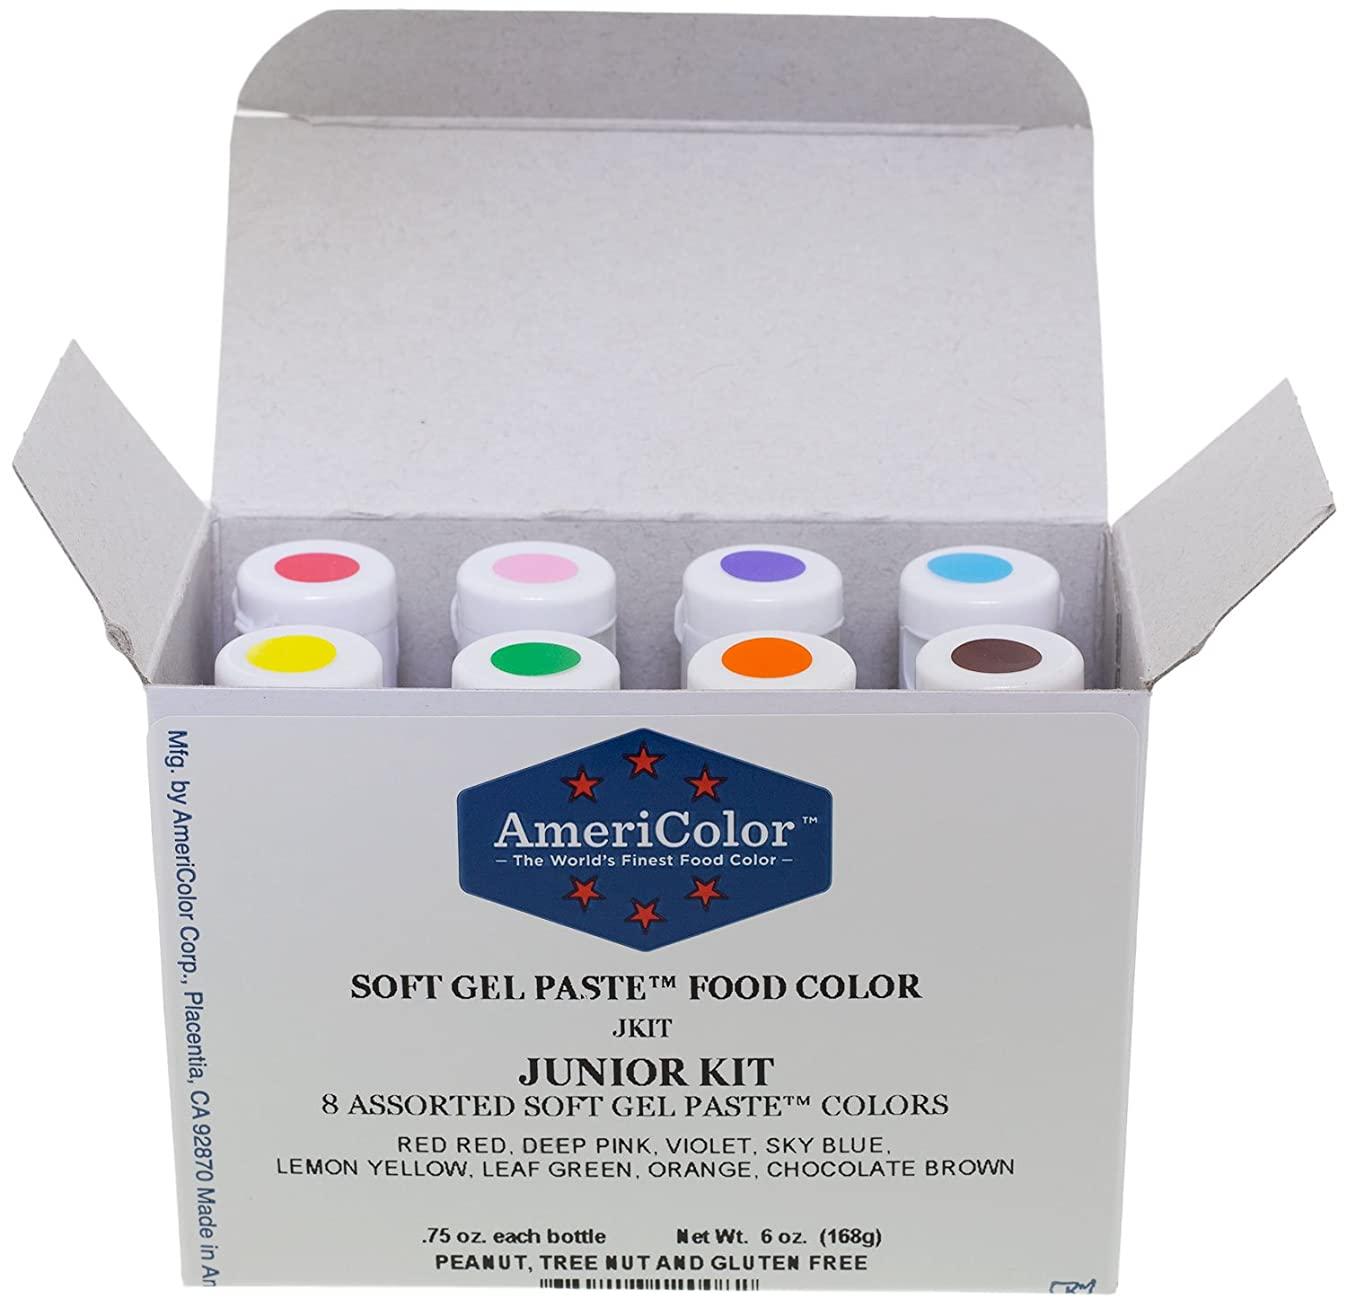 Food Coloring AmeriColor Soft - Gel Paste Junior Kit, 8 Colors.75 Ounce Bottles